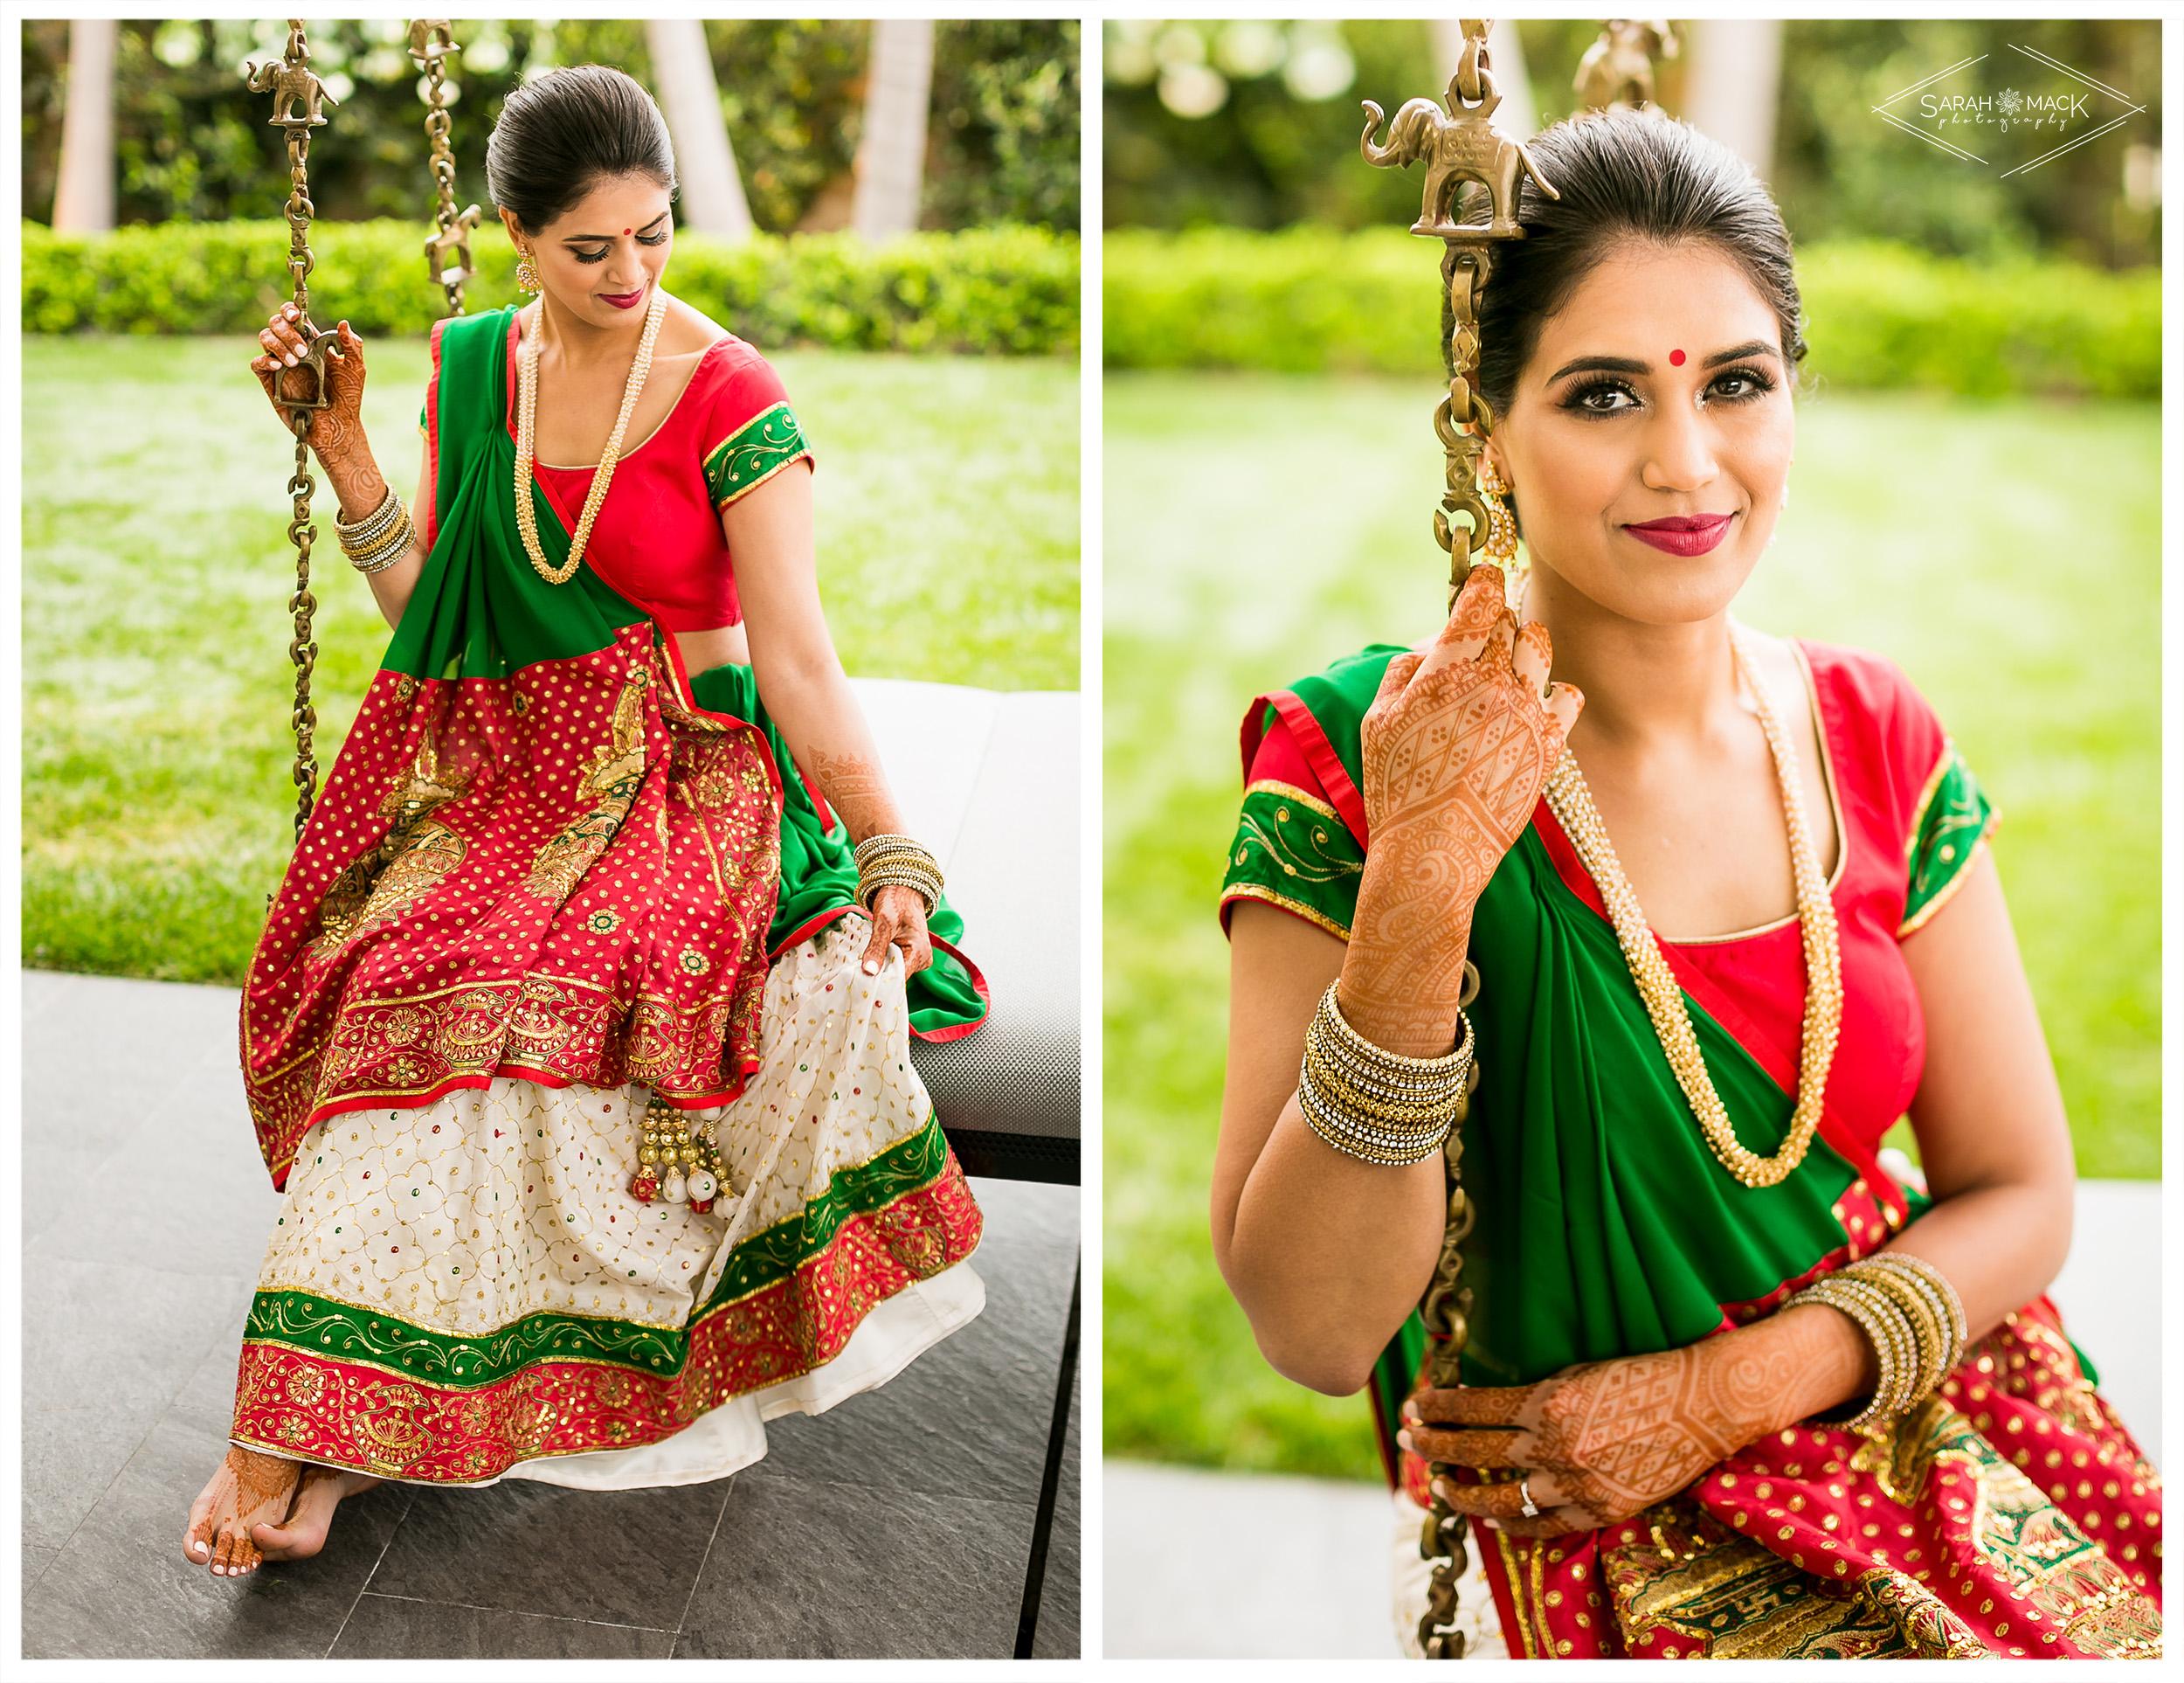 PR-Irvine-Ganesh-Pooja-Indian-Wedding-Photography-2.jpg